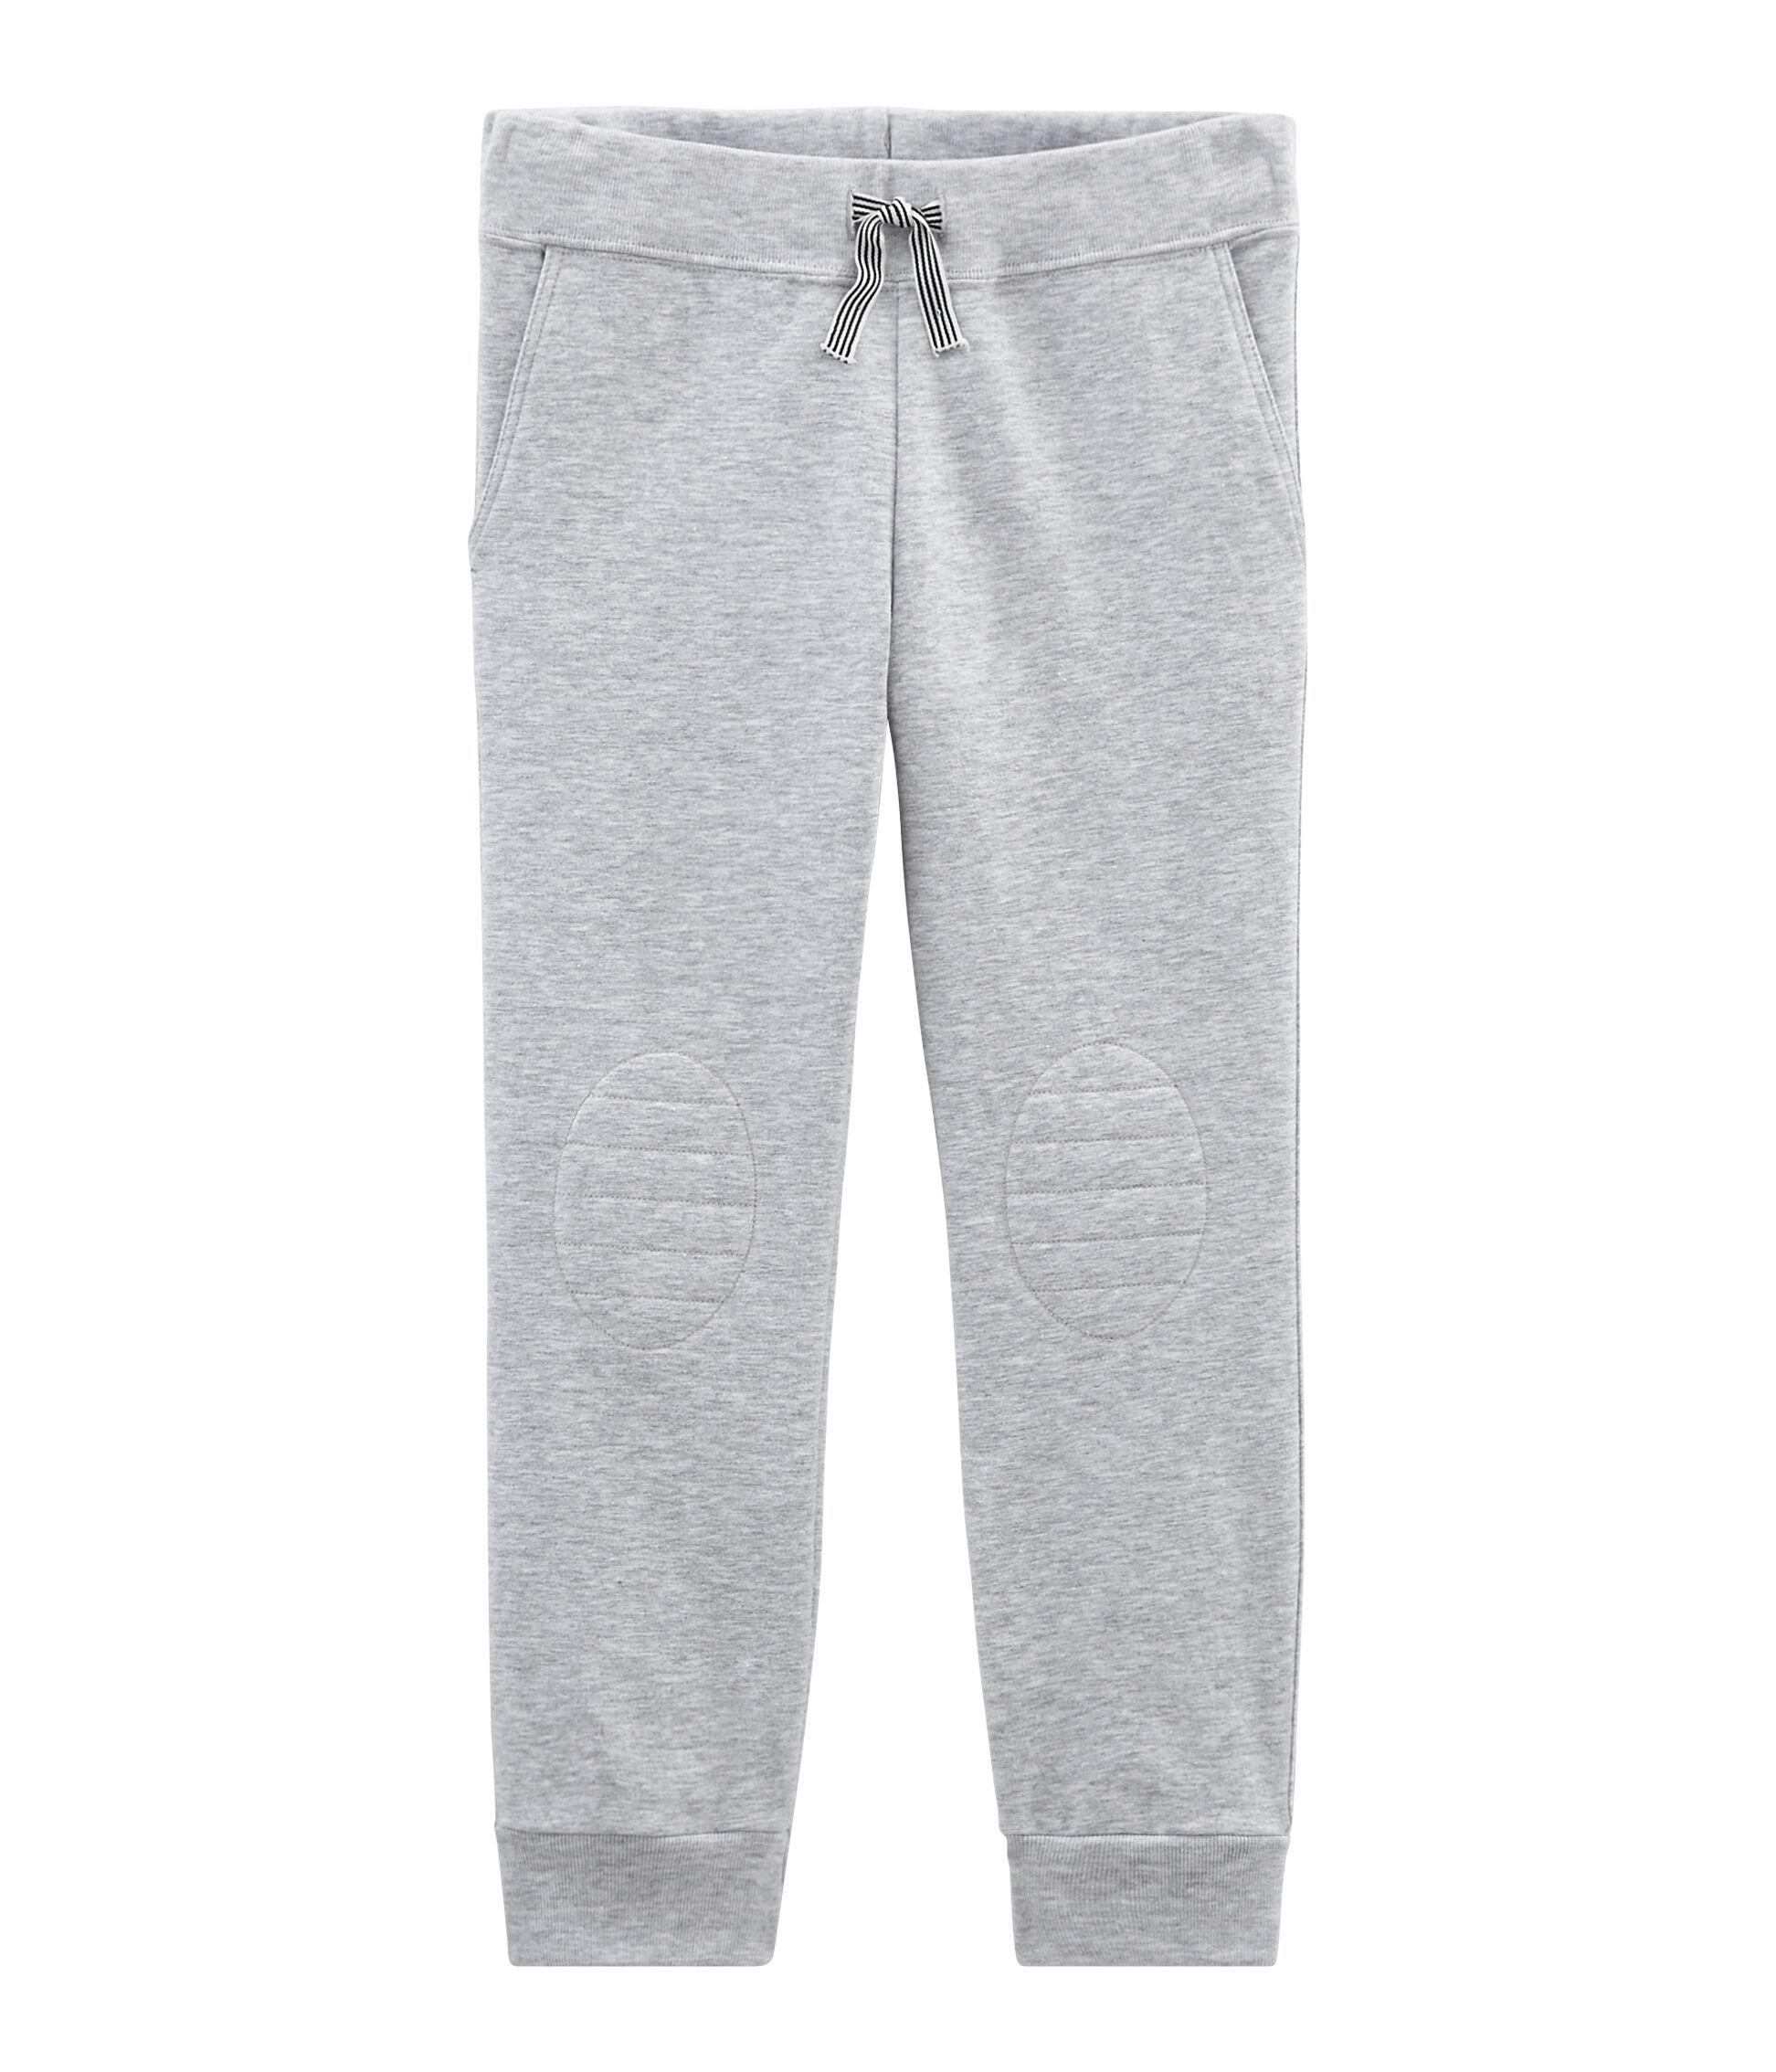 Petit Bateau Boys Pantalons Trousers